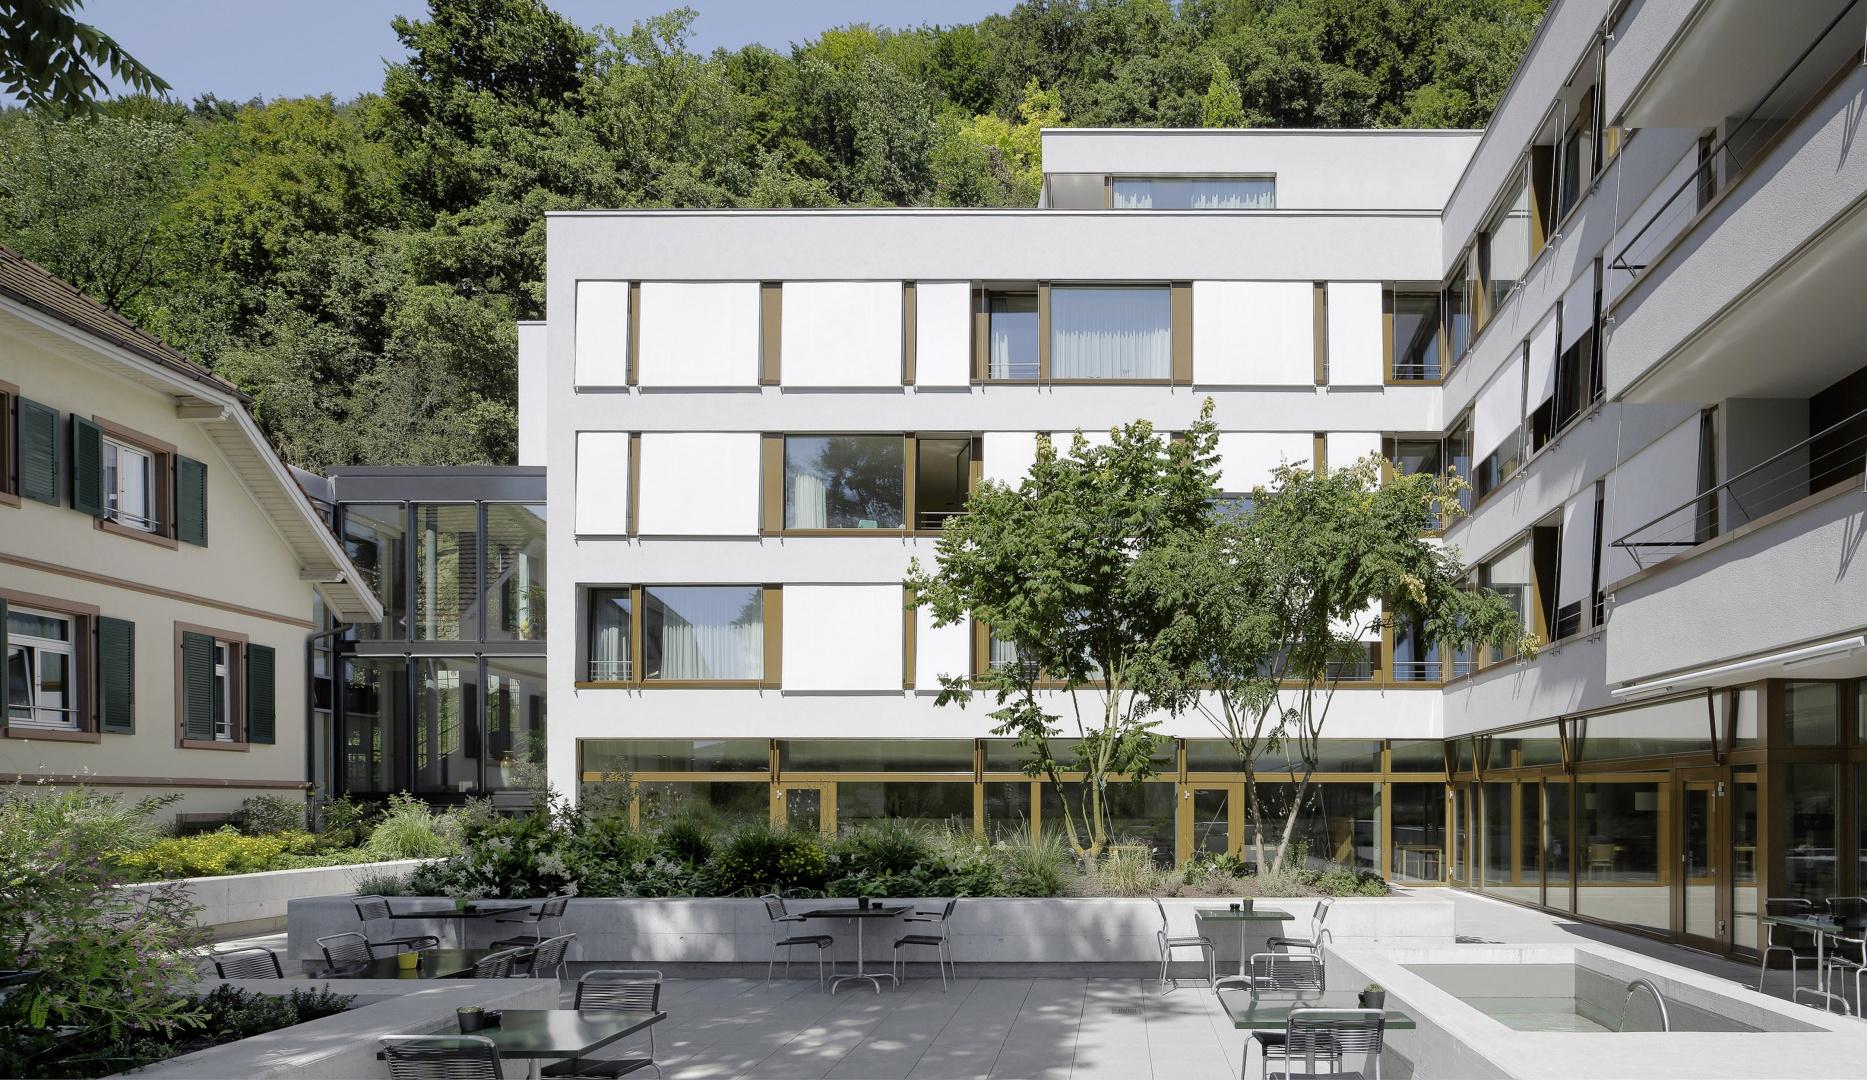 Brunnmatt_Terrasse © Tom Bisig, Basel